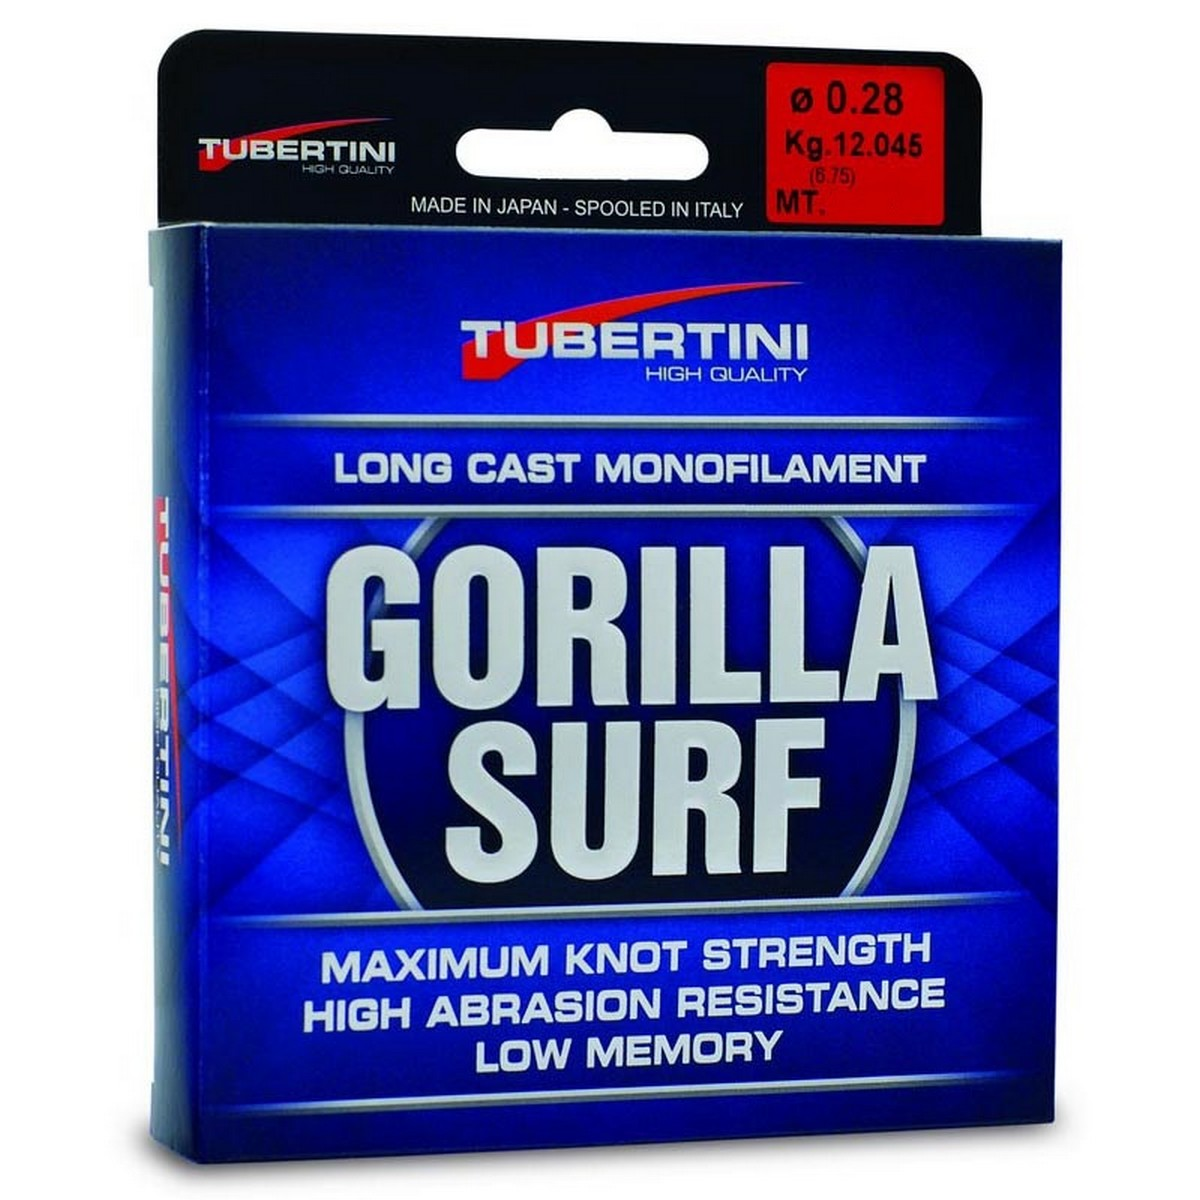 Риболовно влакно Tubertini Gorilla Surf 200m